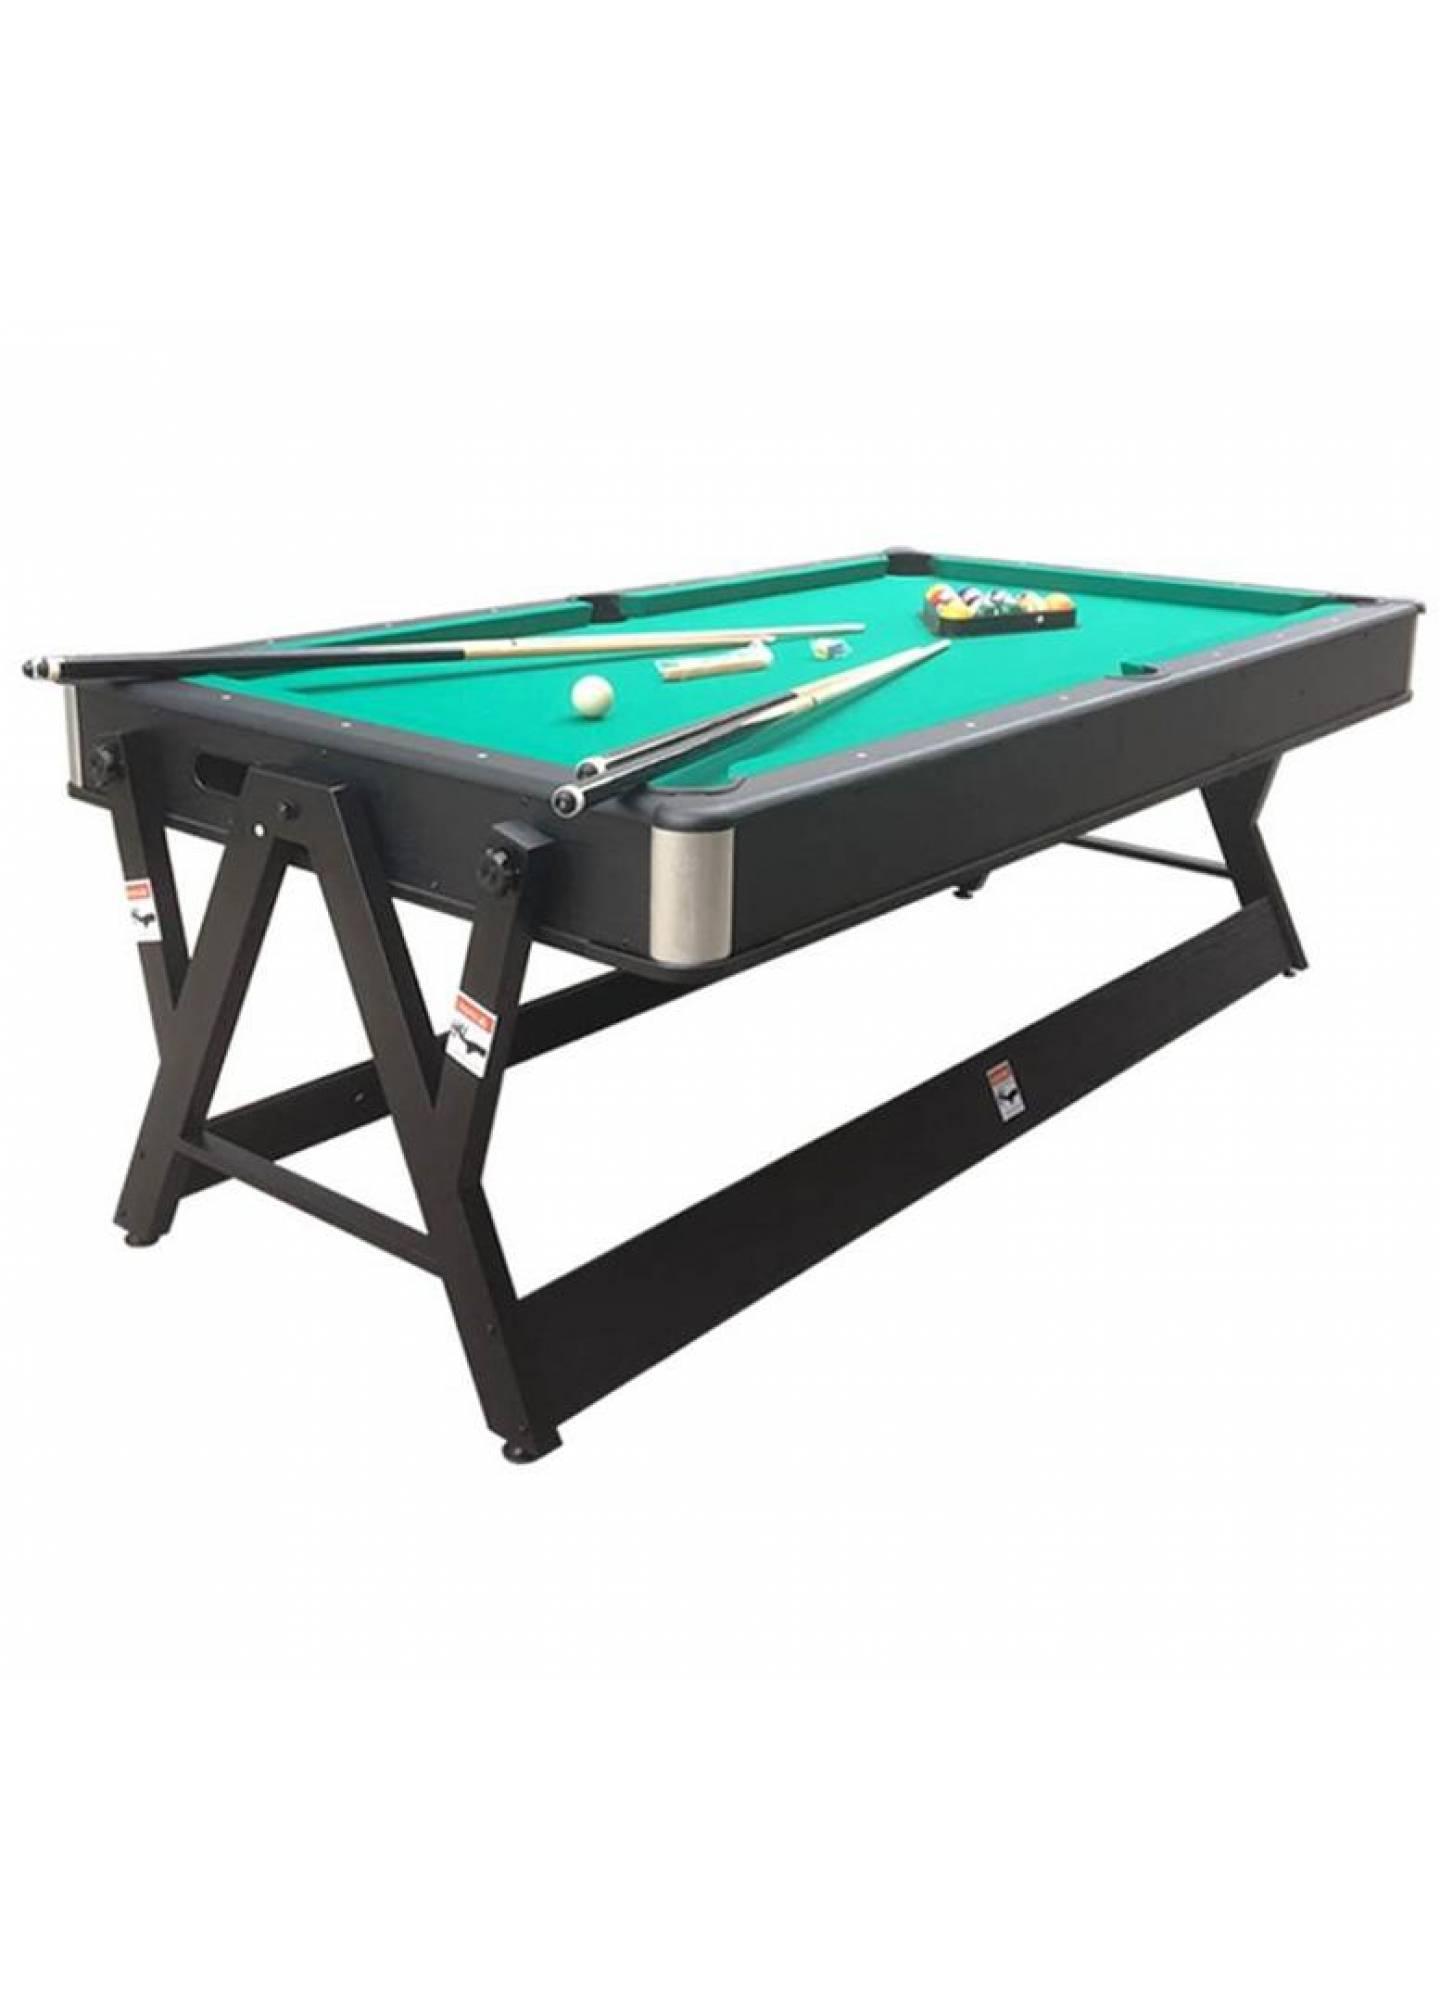 ATLANTA MULTI GAME TABLE (POOL, AIR HOCKEY, ROULETTE, POKER)